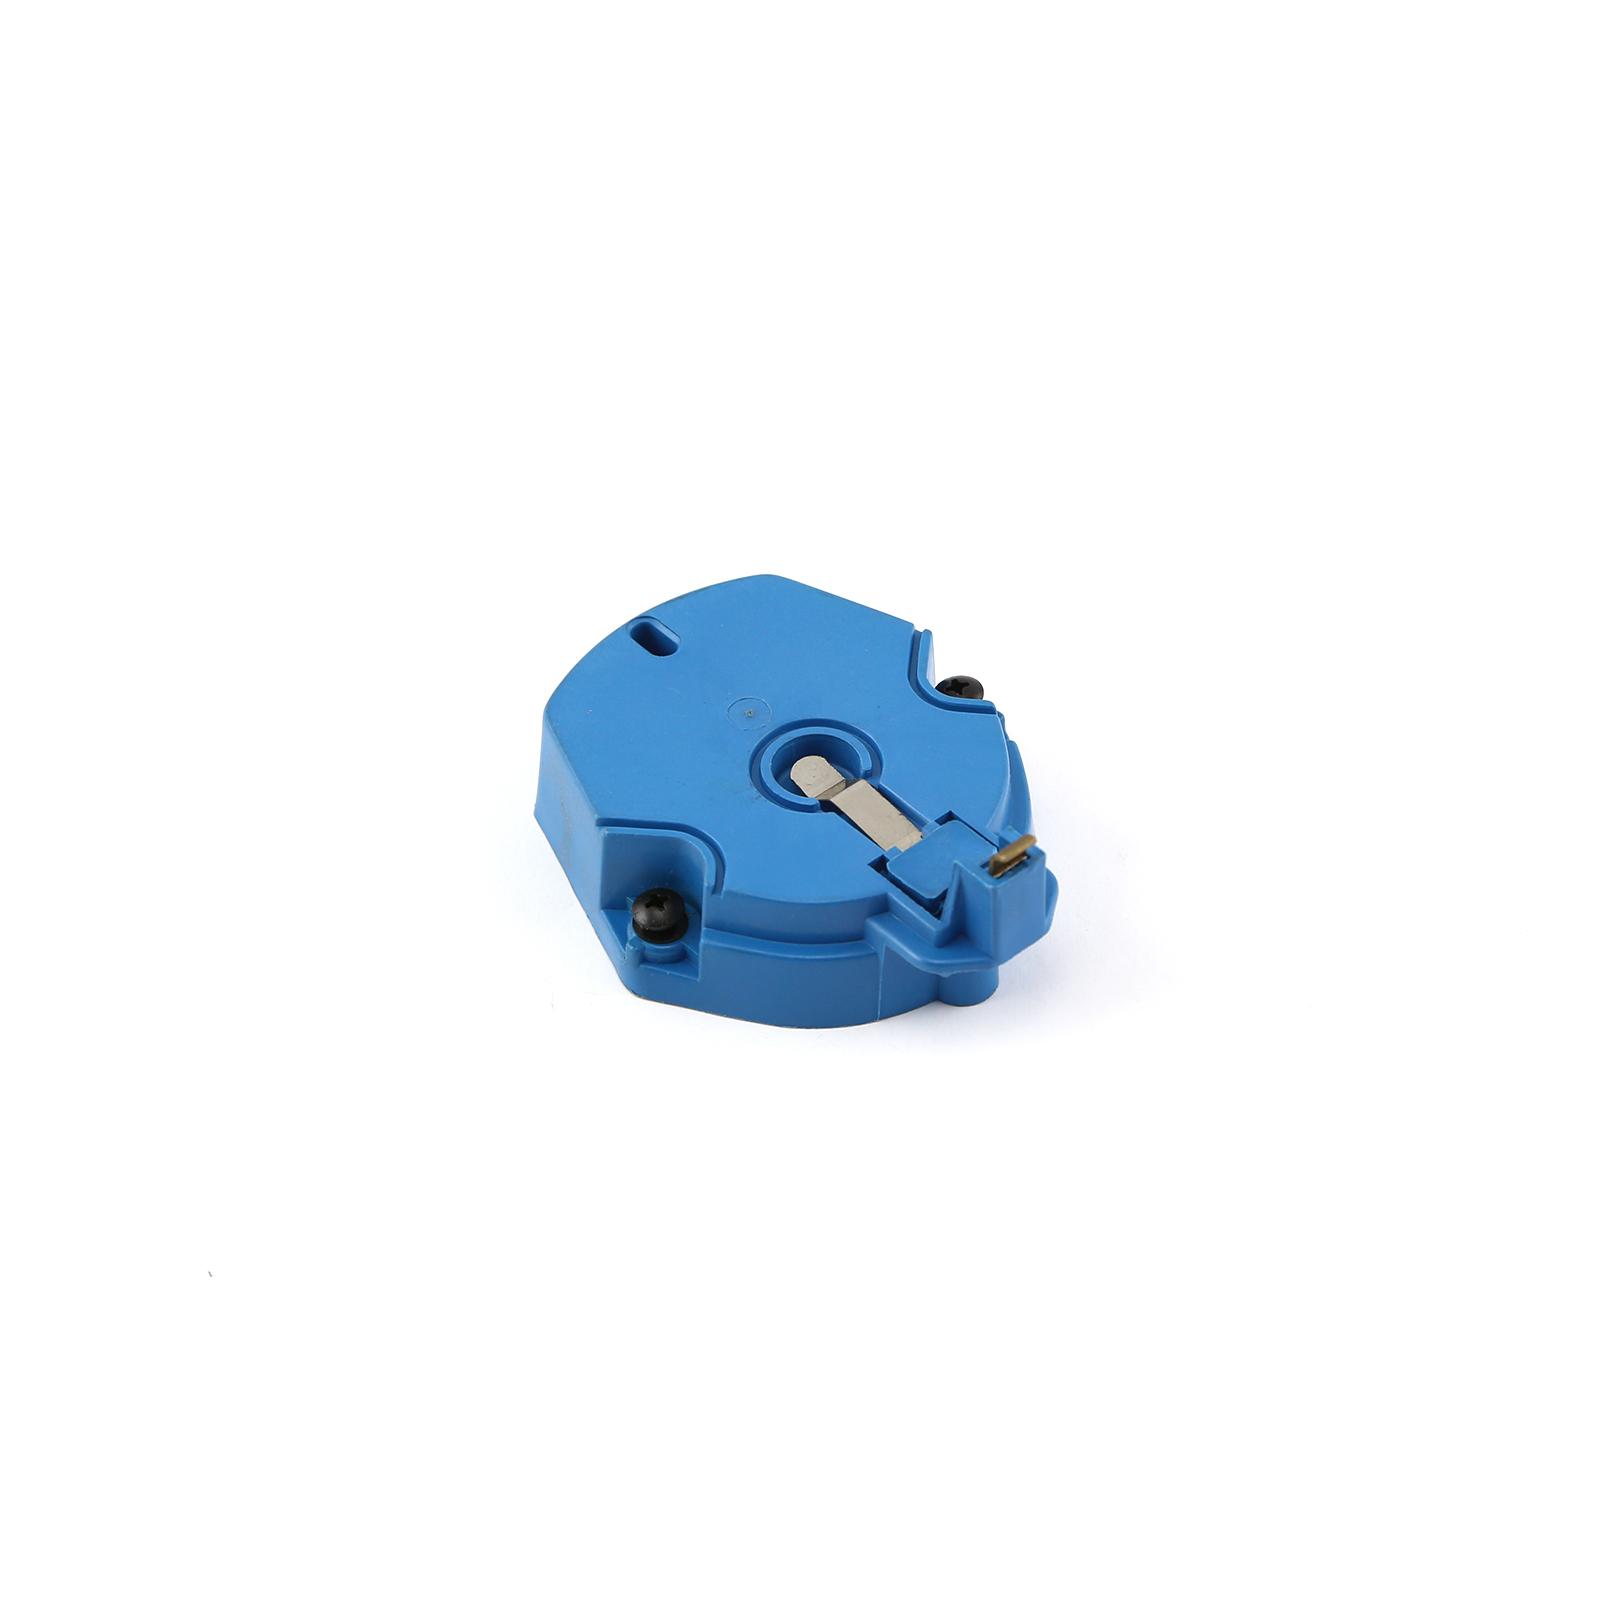 6000 Series HEI Distributor Rotor - Blue